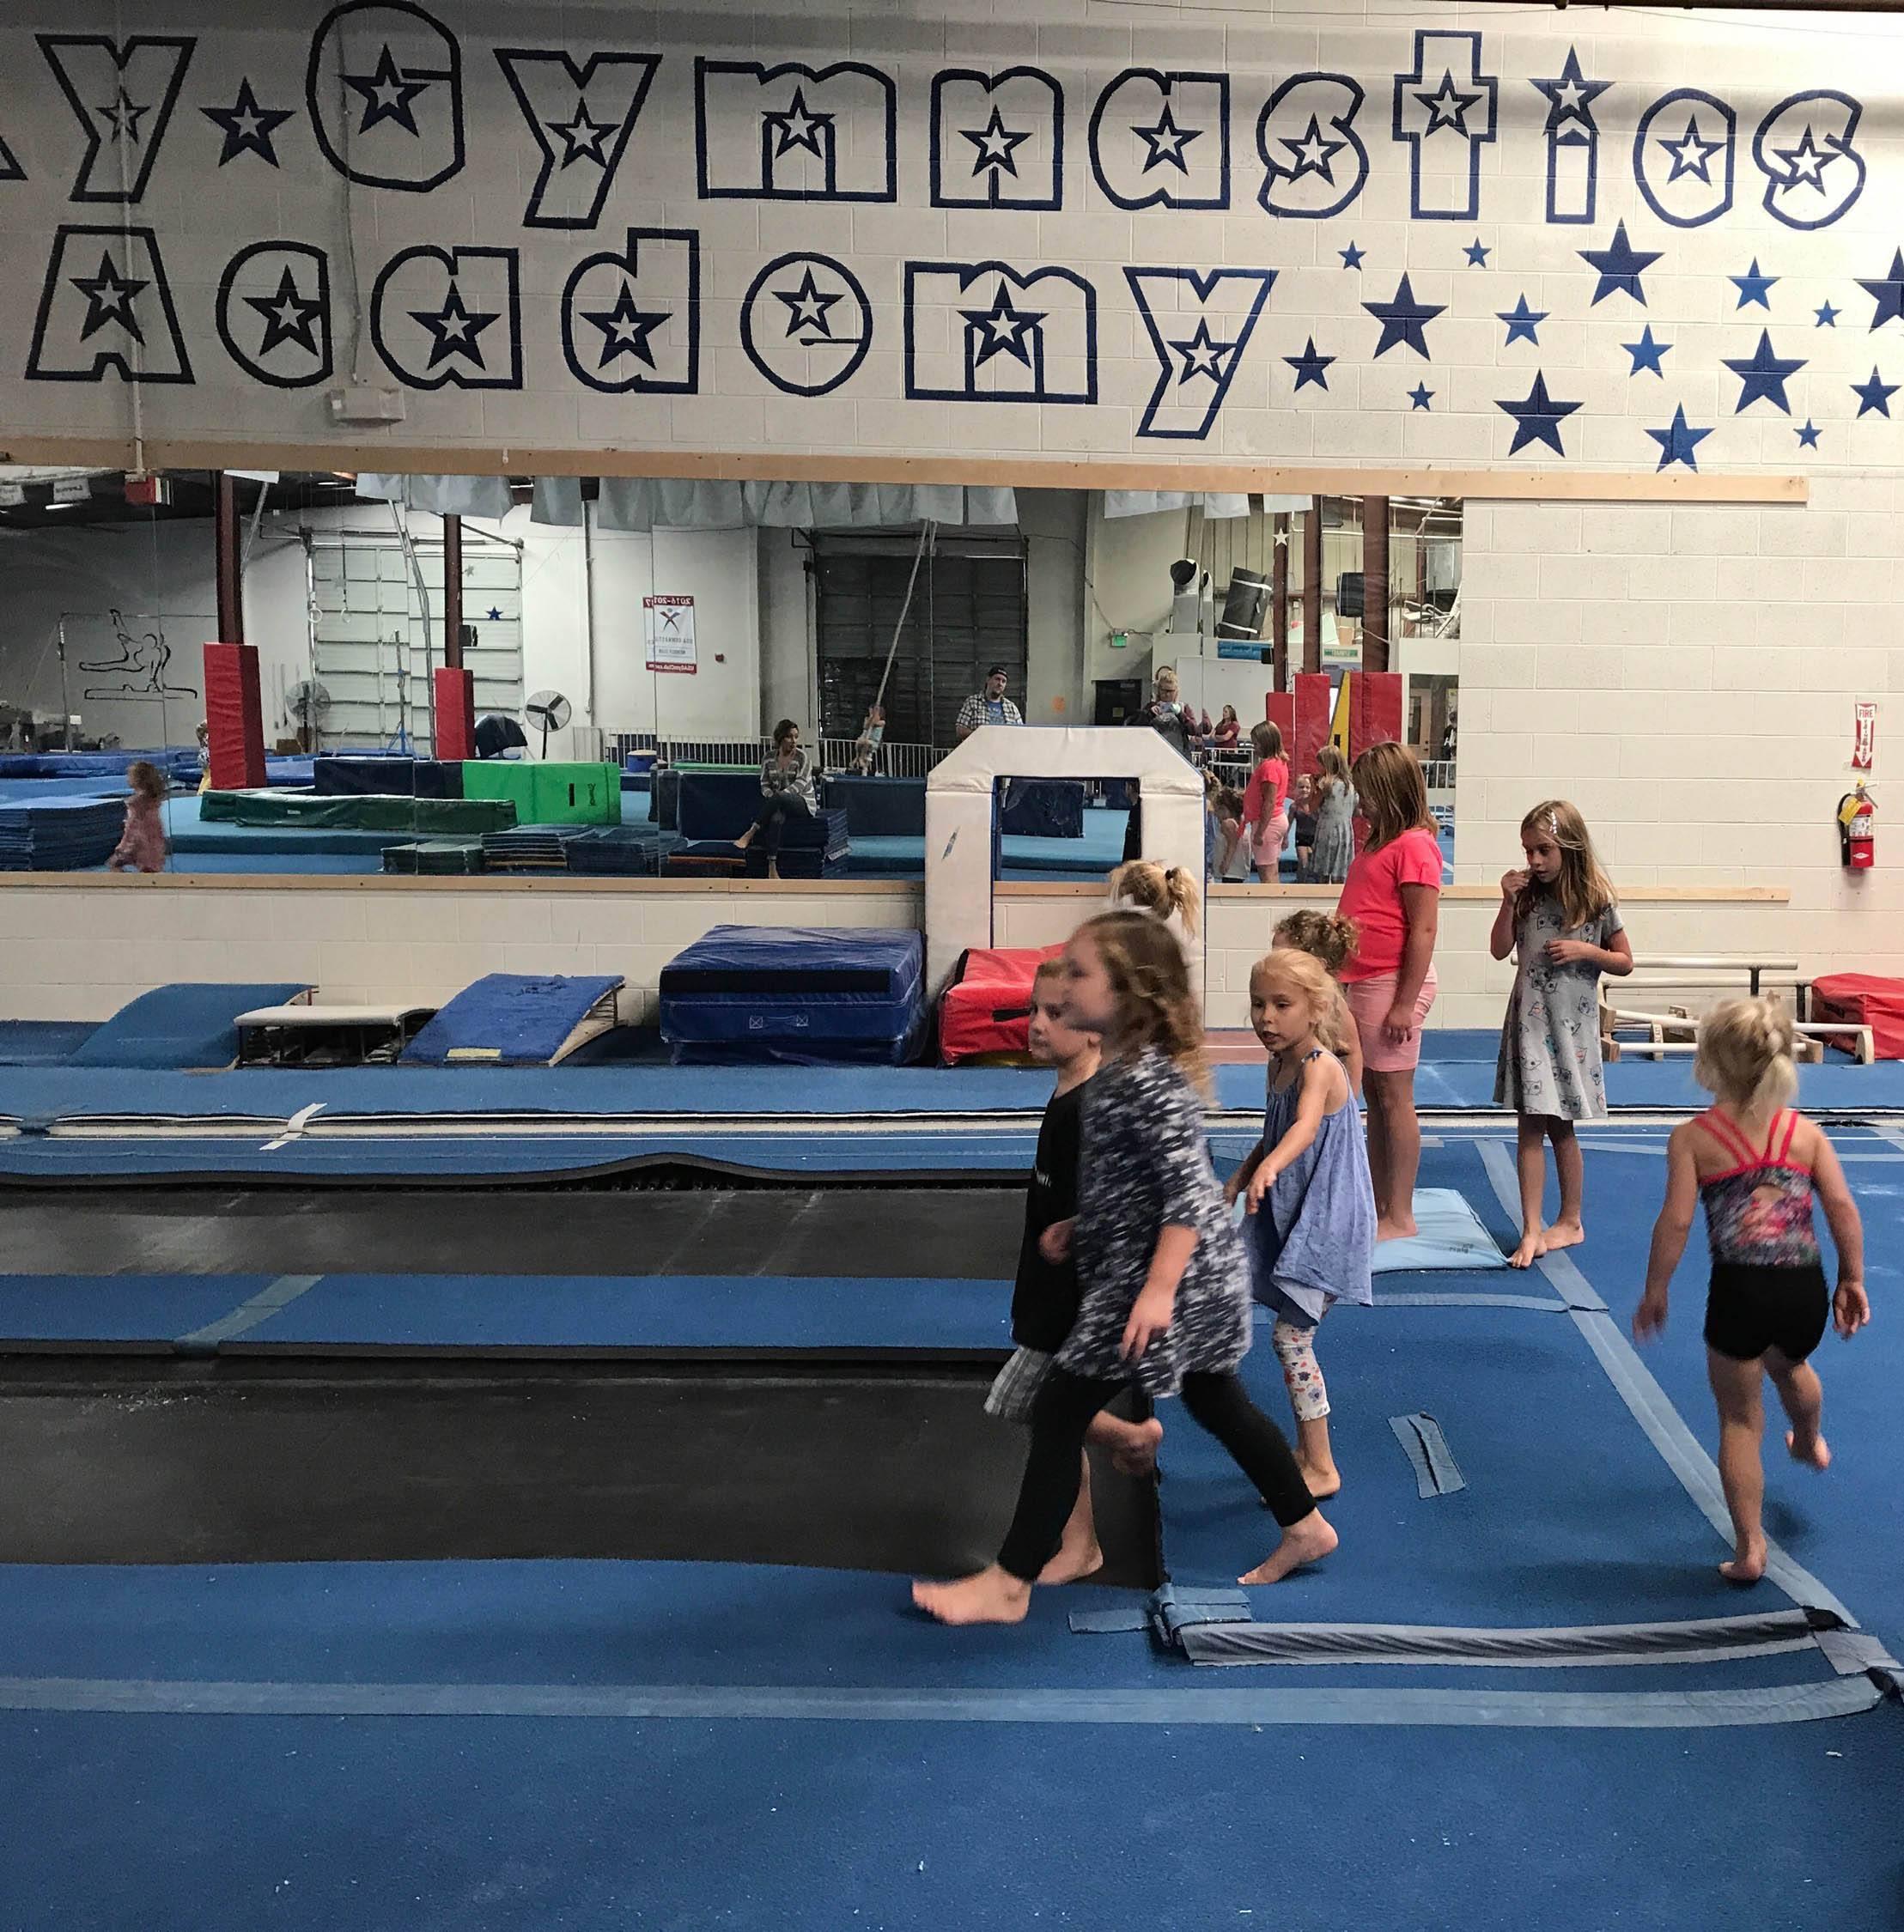 birthday-parties-gallery-galaxy-gymnastics-academy-08.jpg